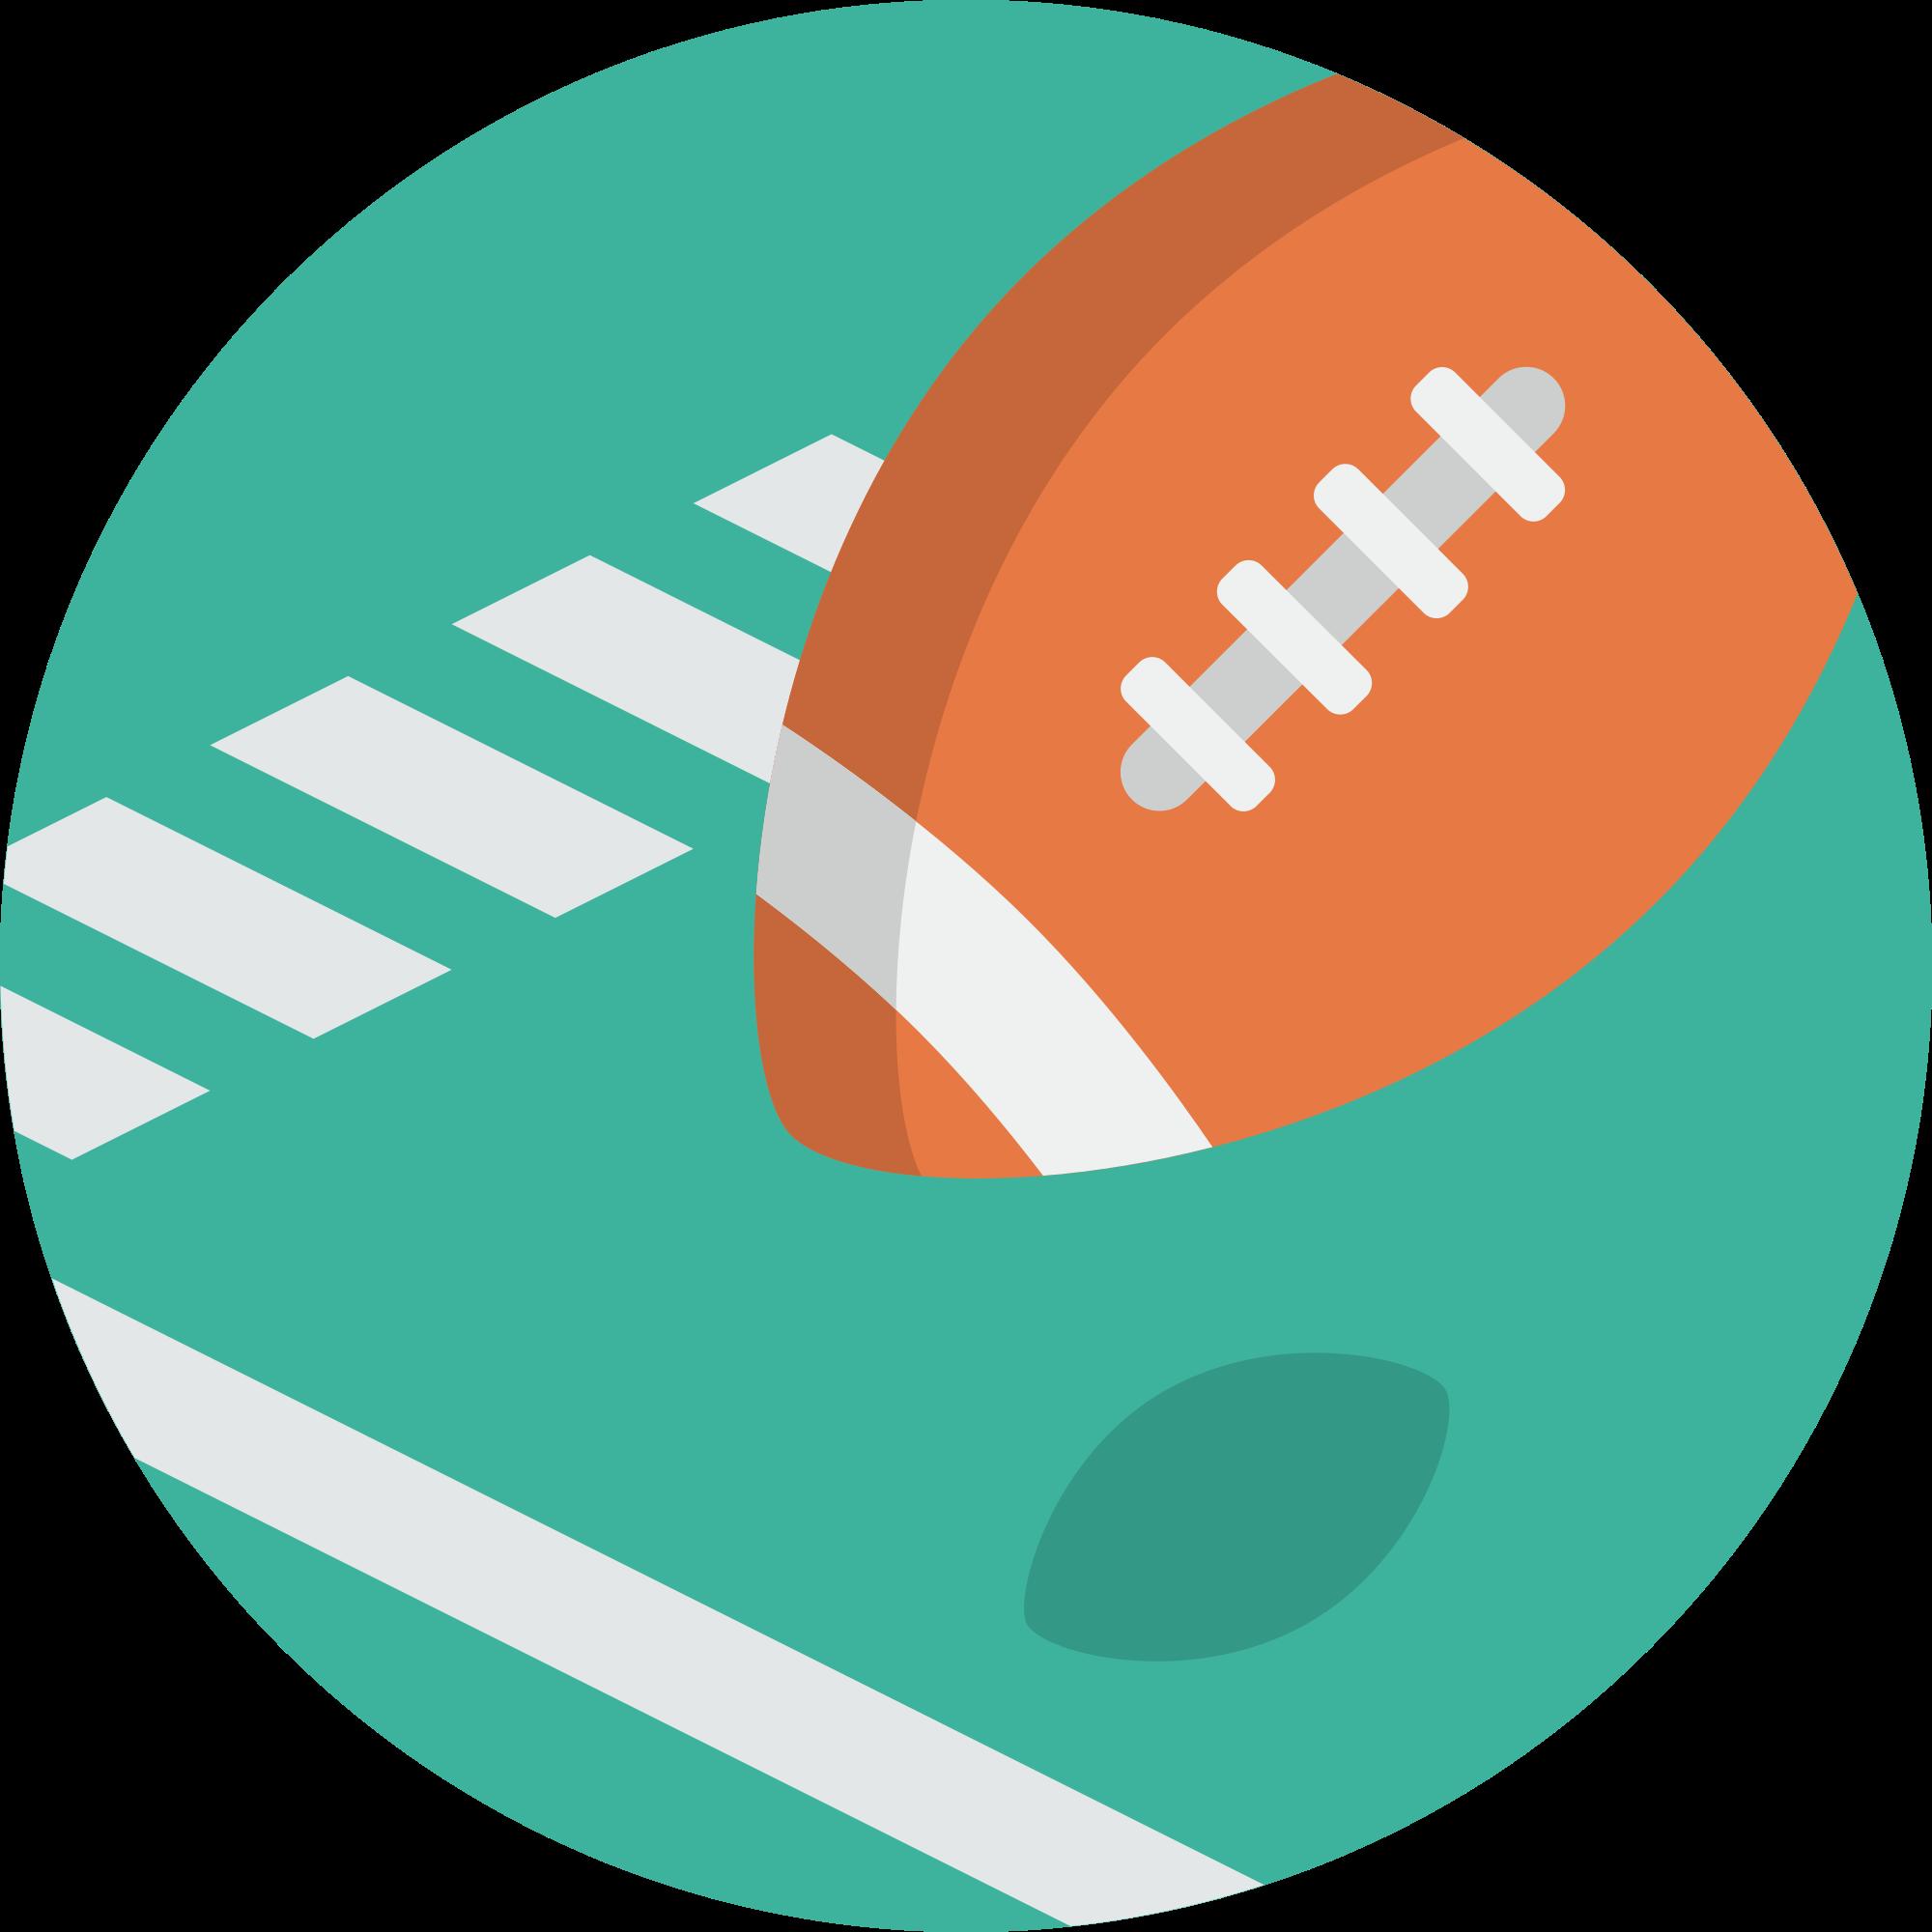 File ballonicon svg wikimedia. Football americain clipart